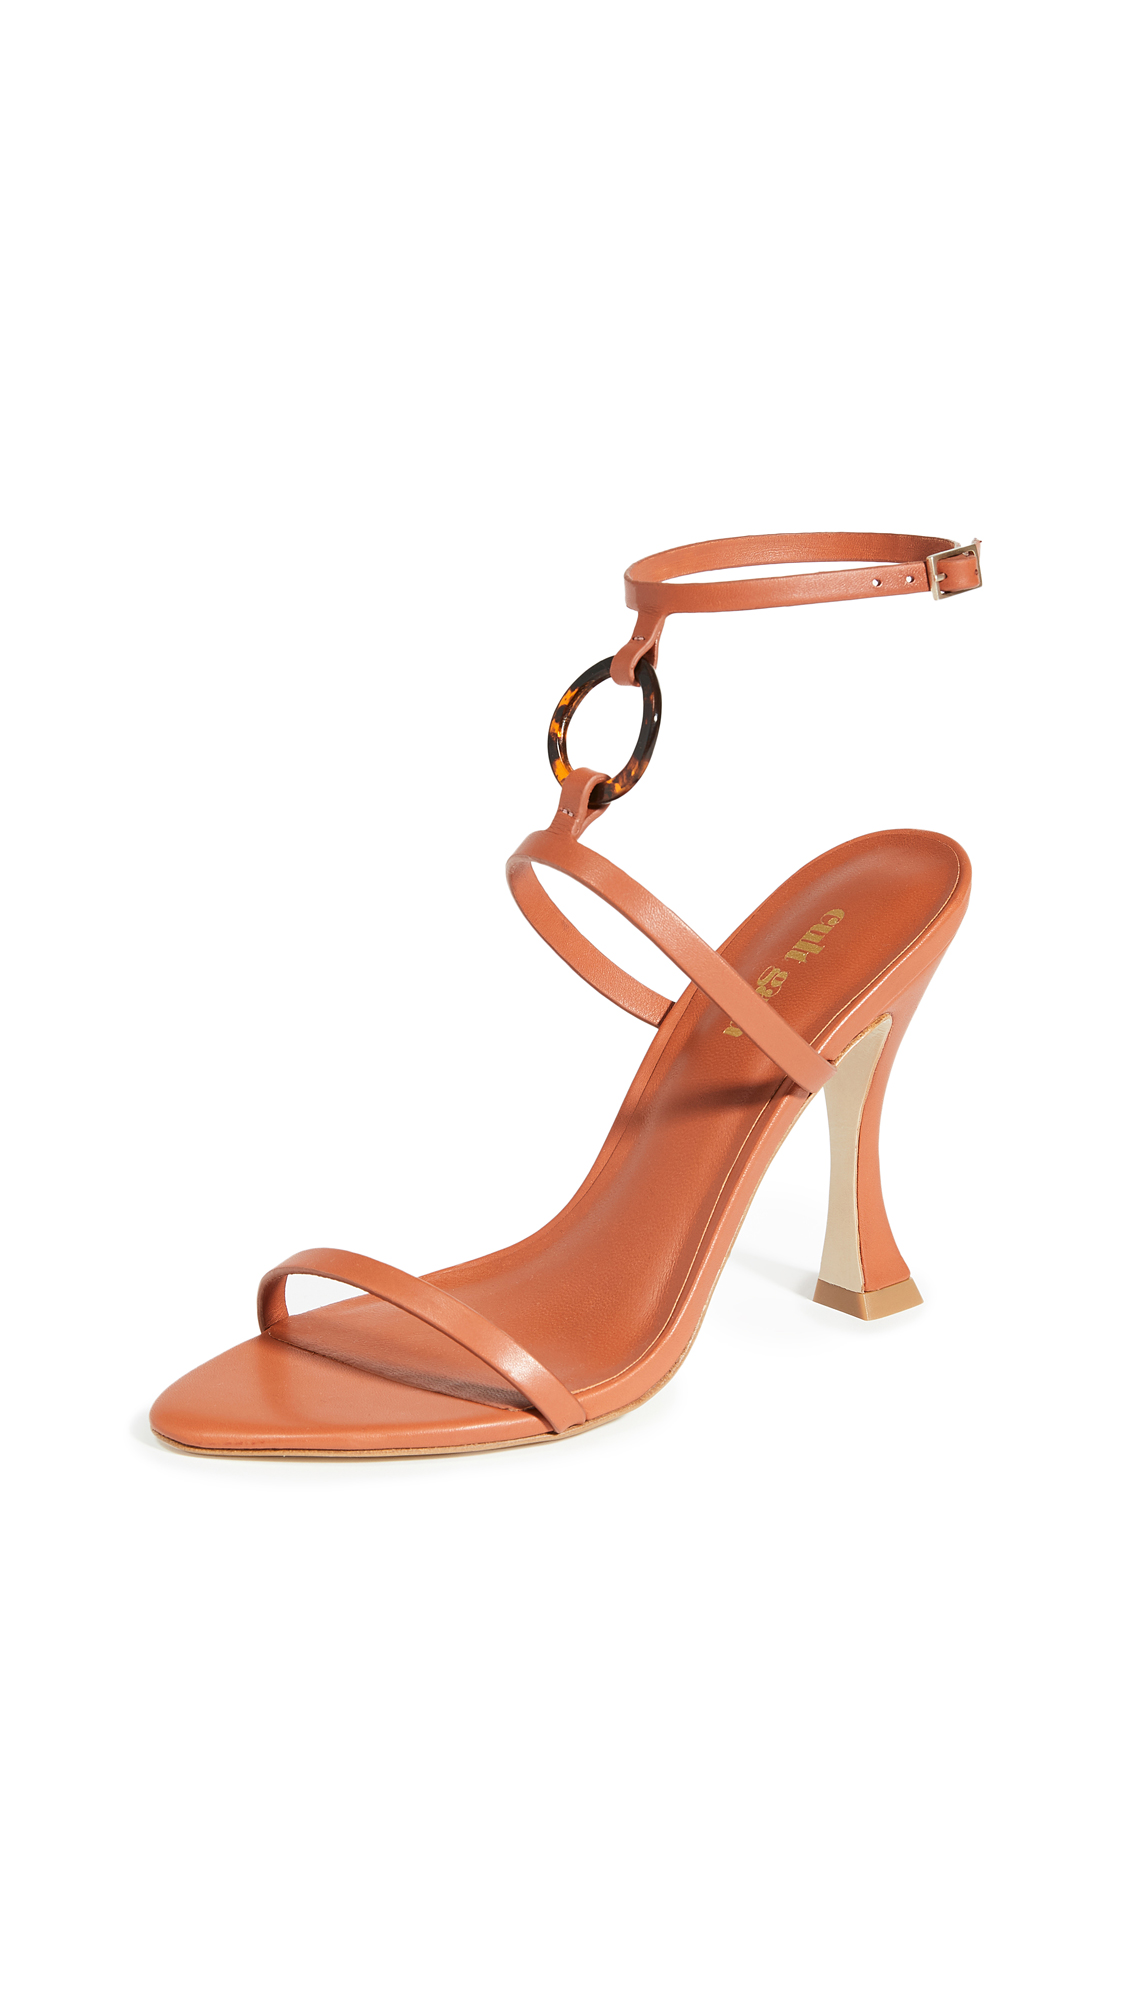 Cult Gaia Camille Heel Sandals